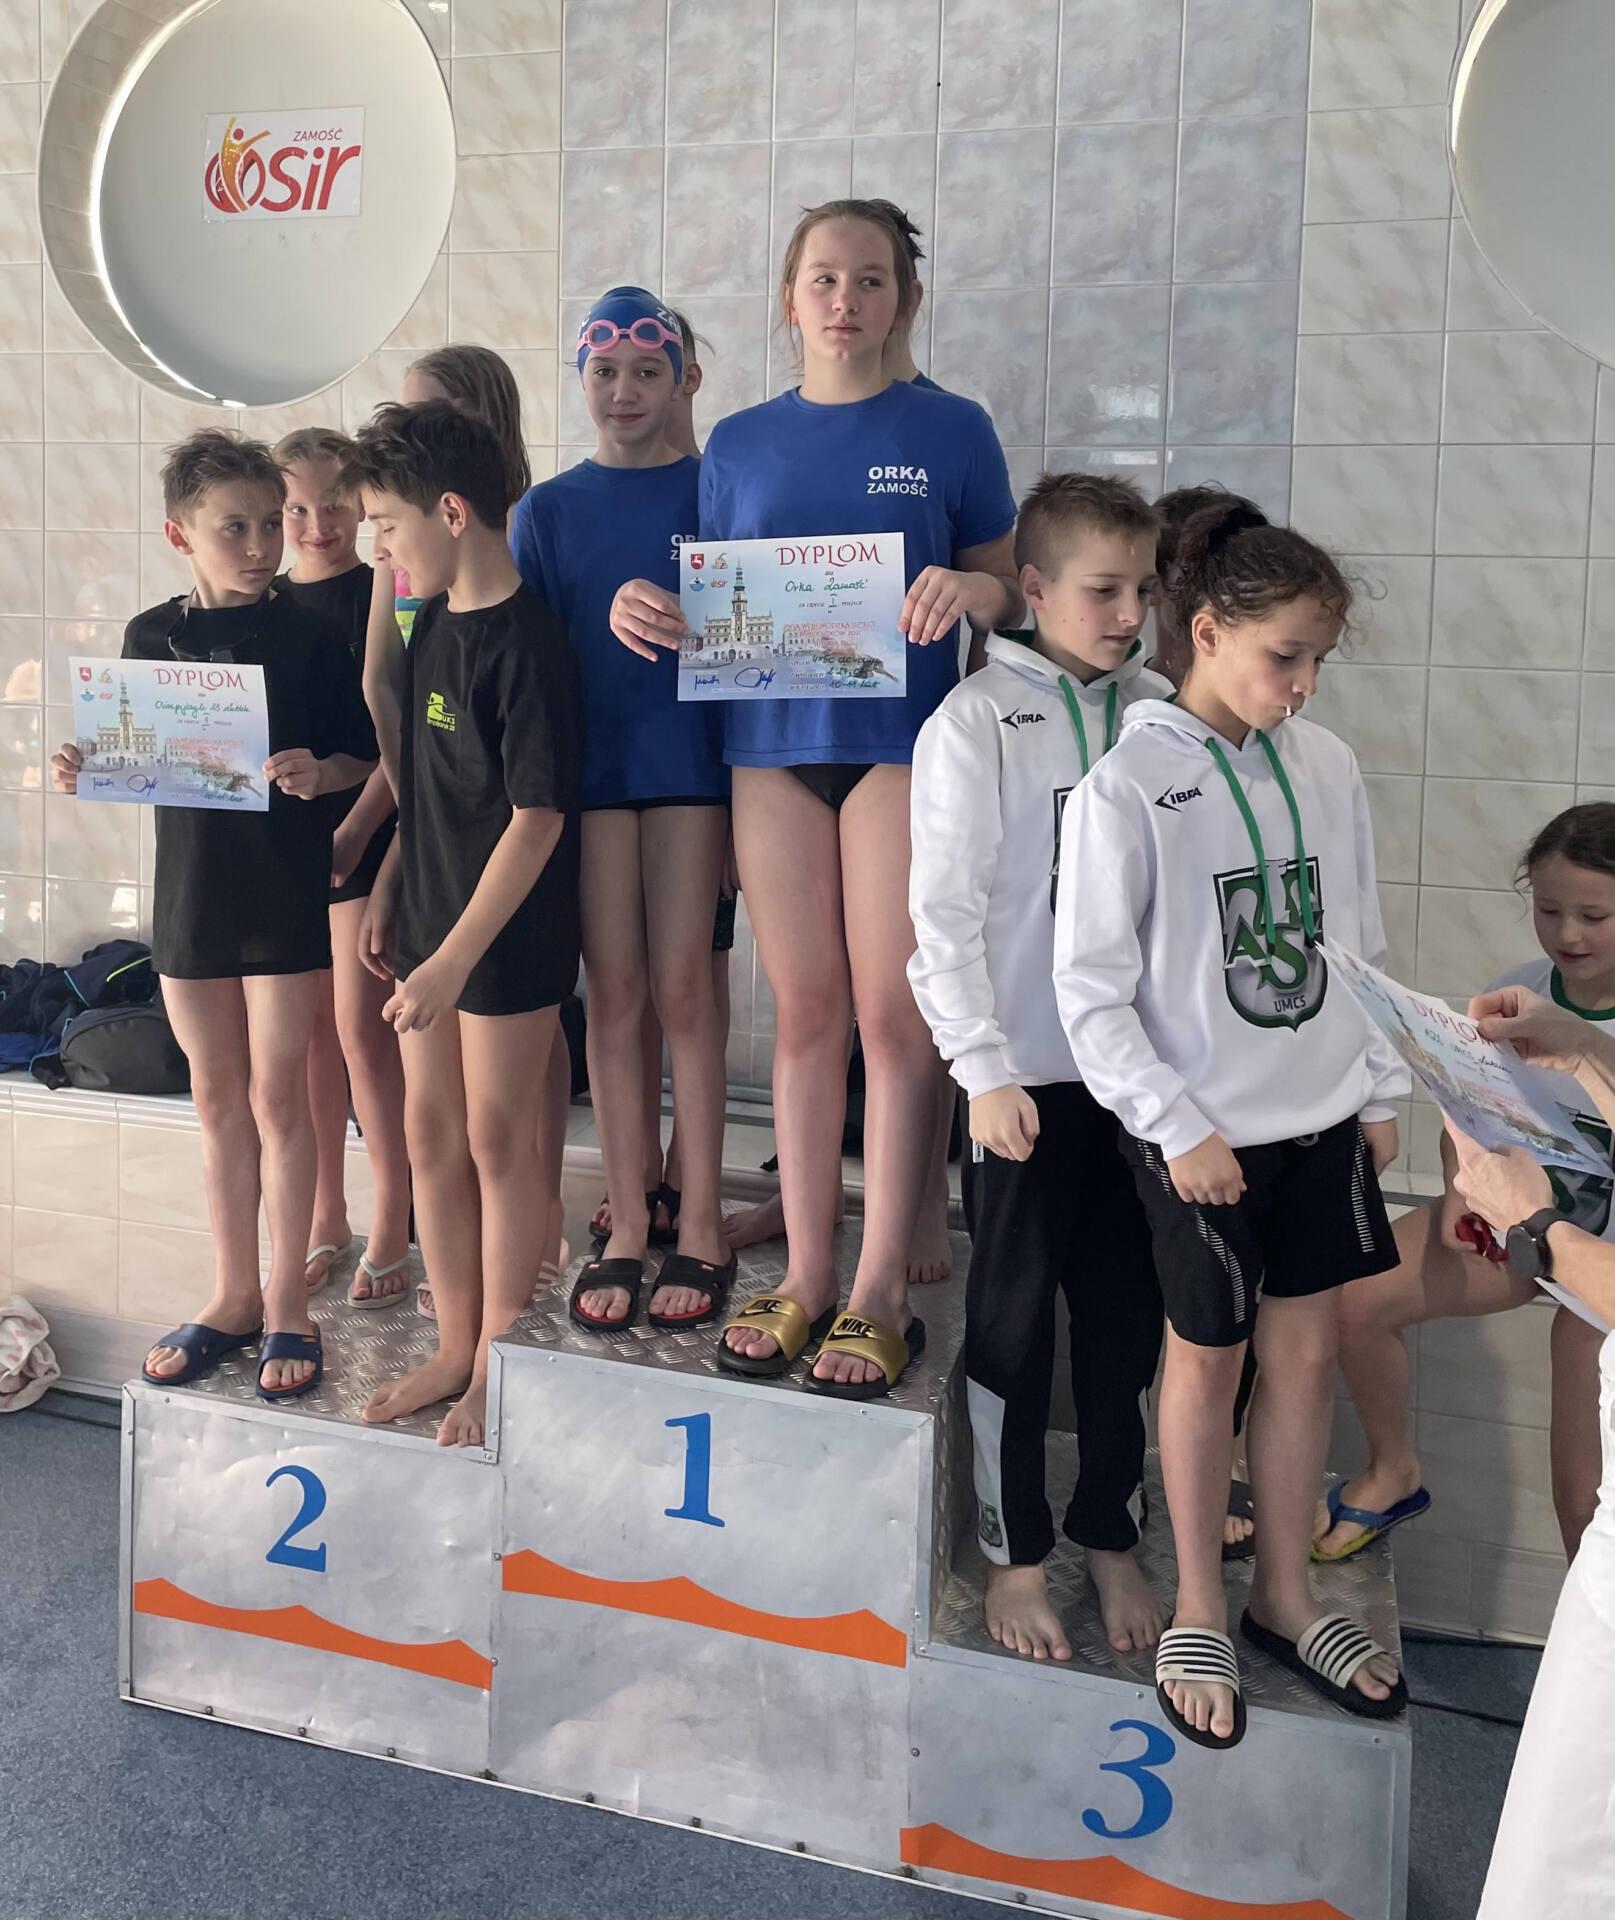 2 2 Pięć medali Orki